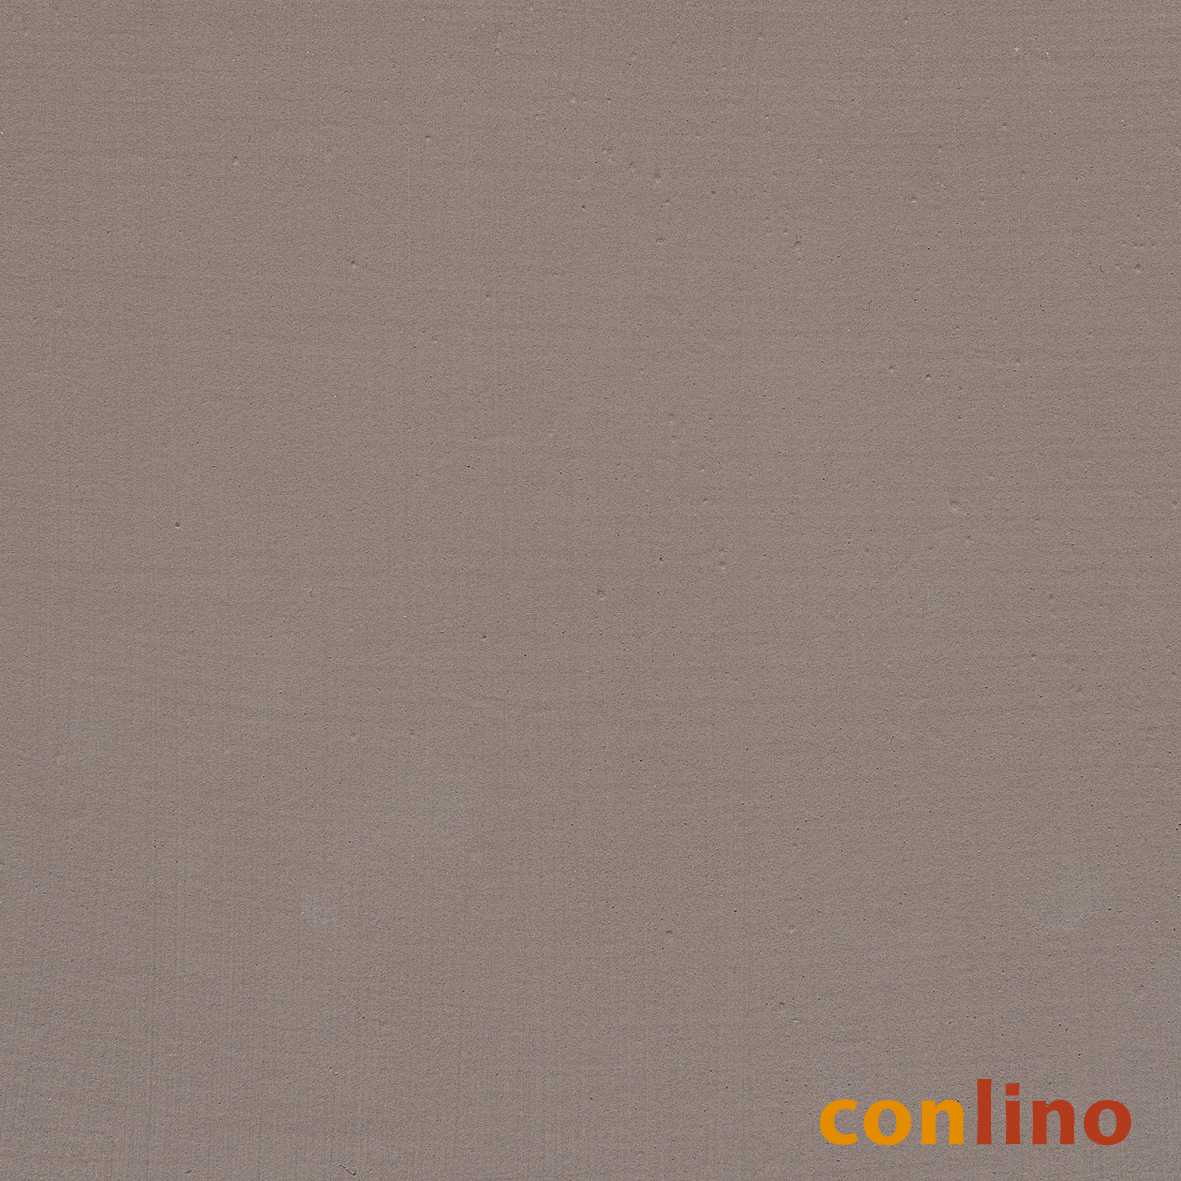 conluto Lehmfarbe Ardesia CL 110